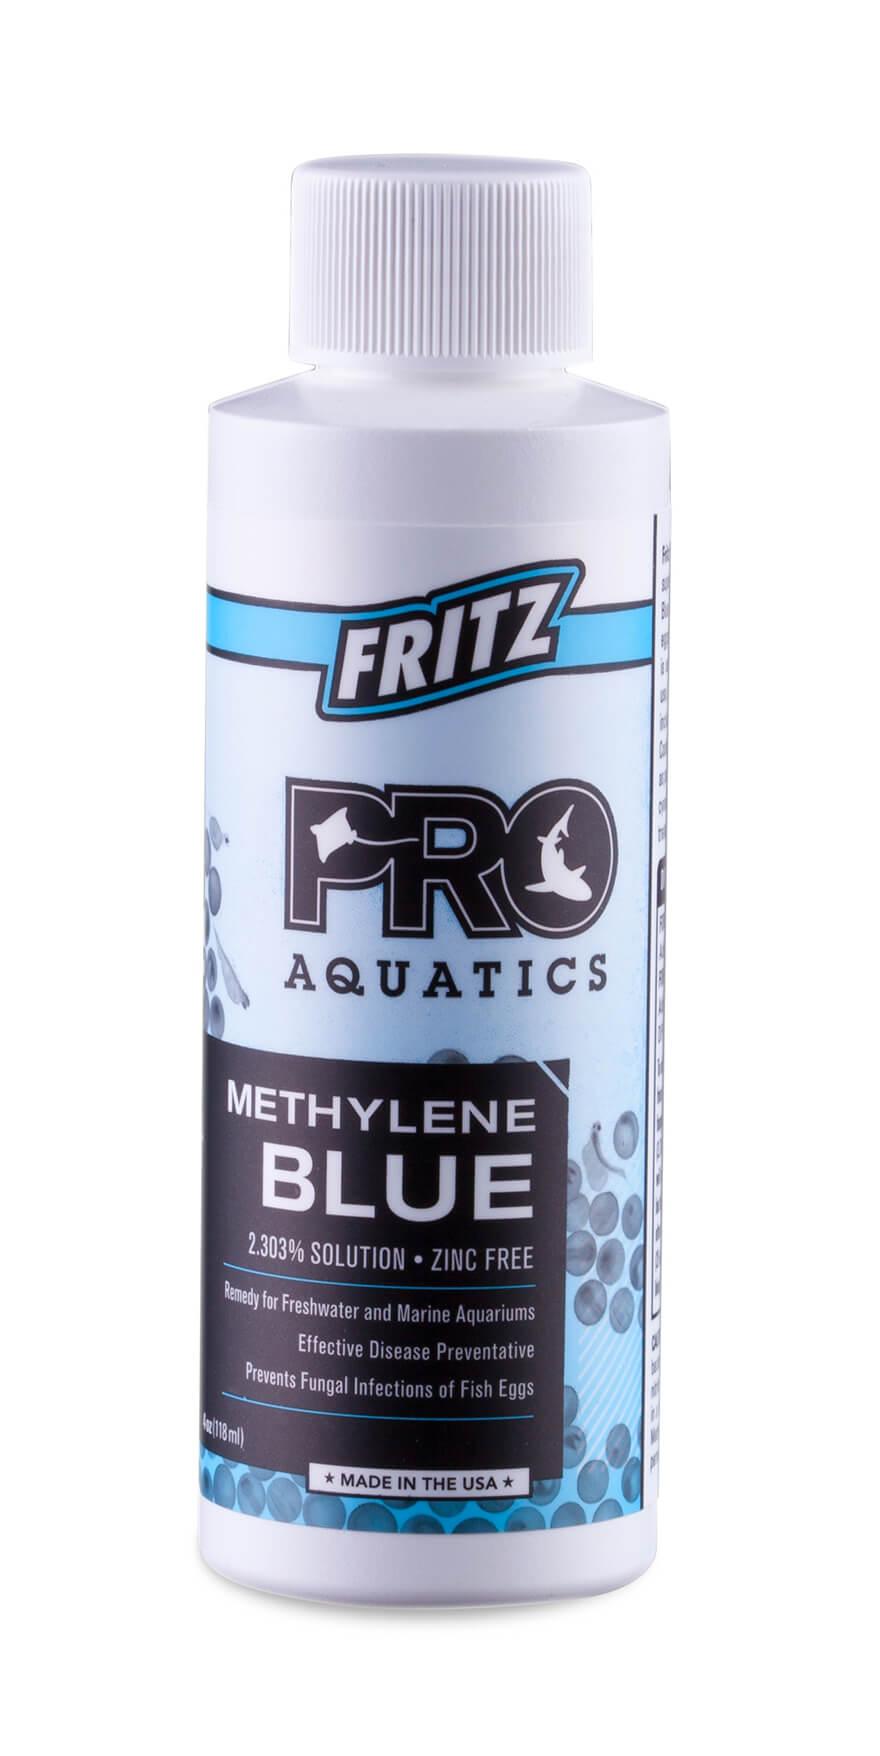 Fritz medications for Methylene blue fish